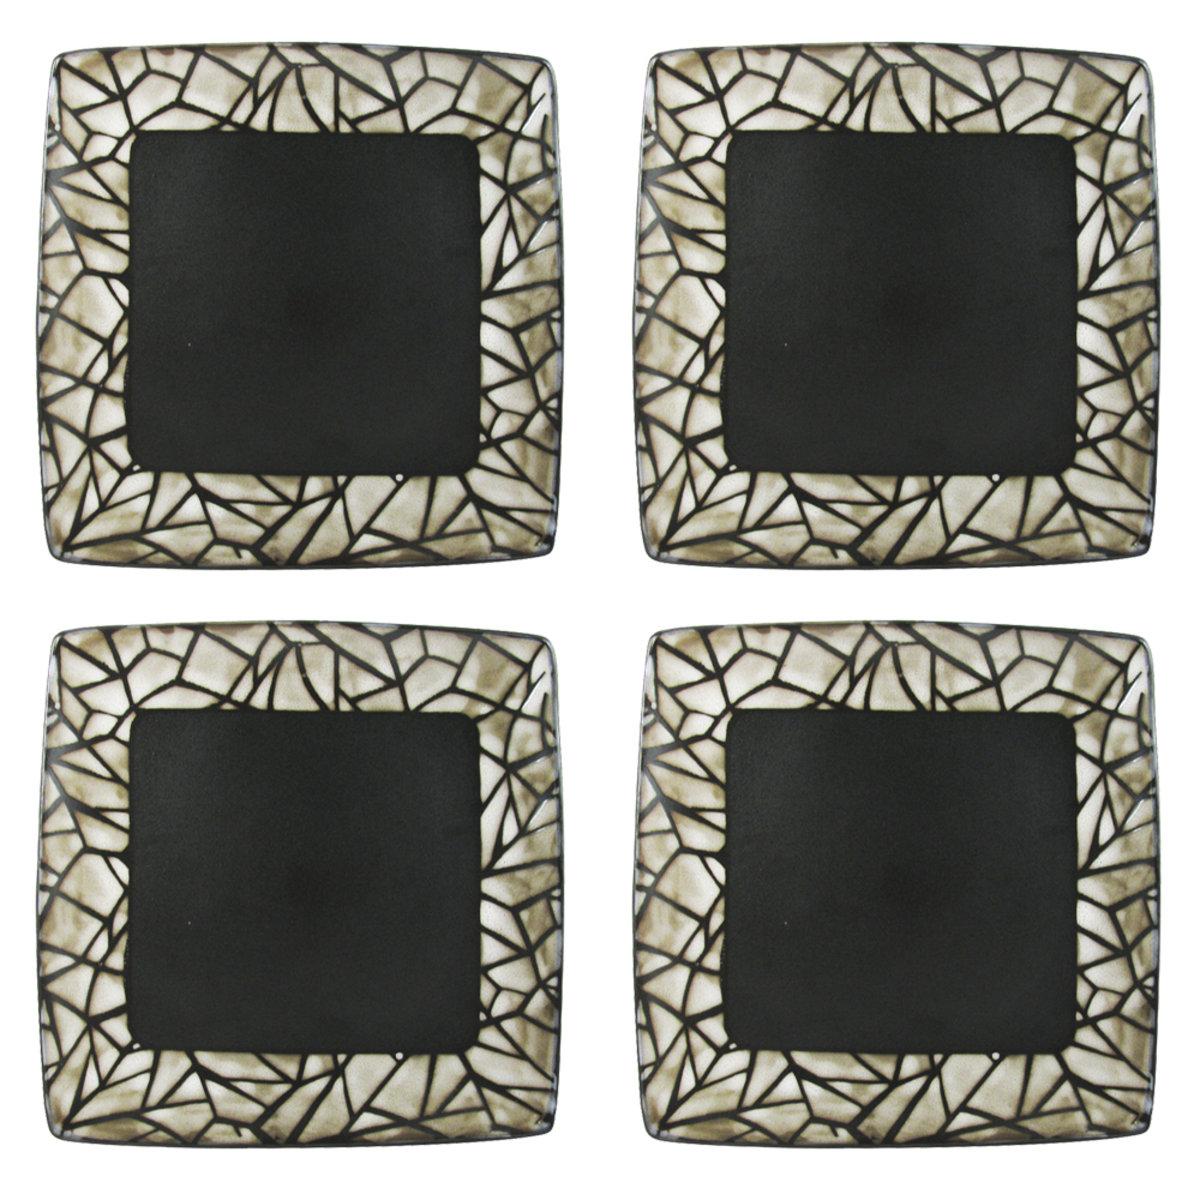 Set Platos Mesa Trinche Ceramica 4 Pz Crown Baccara